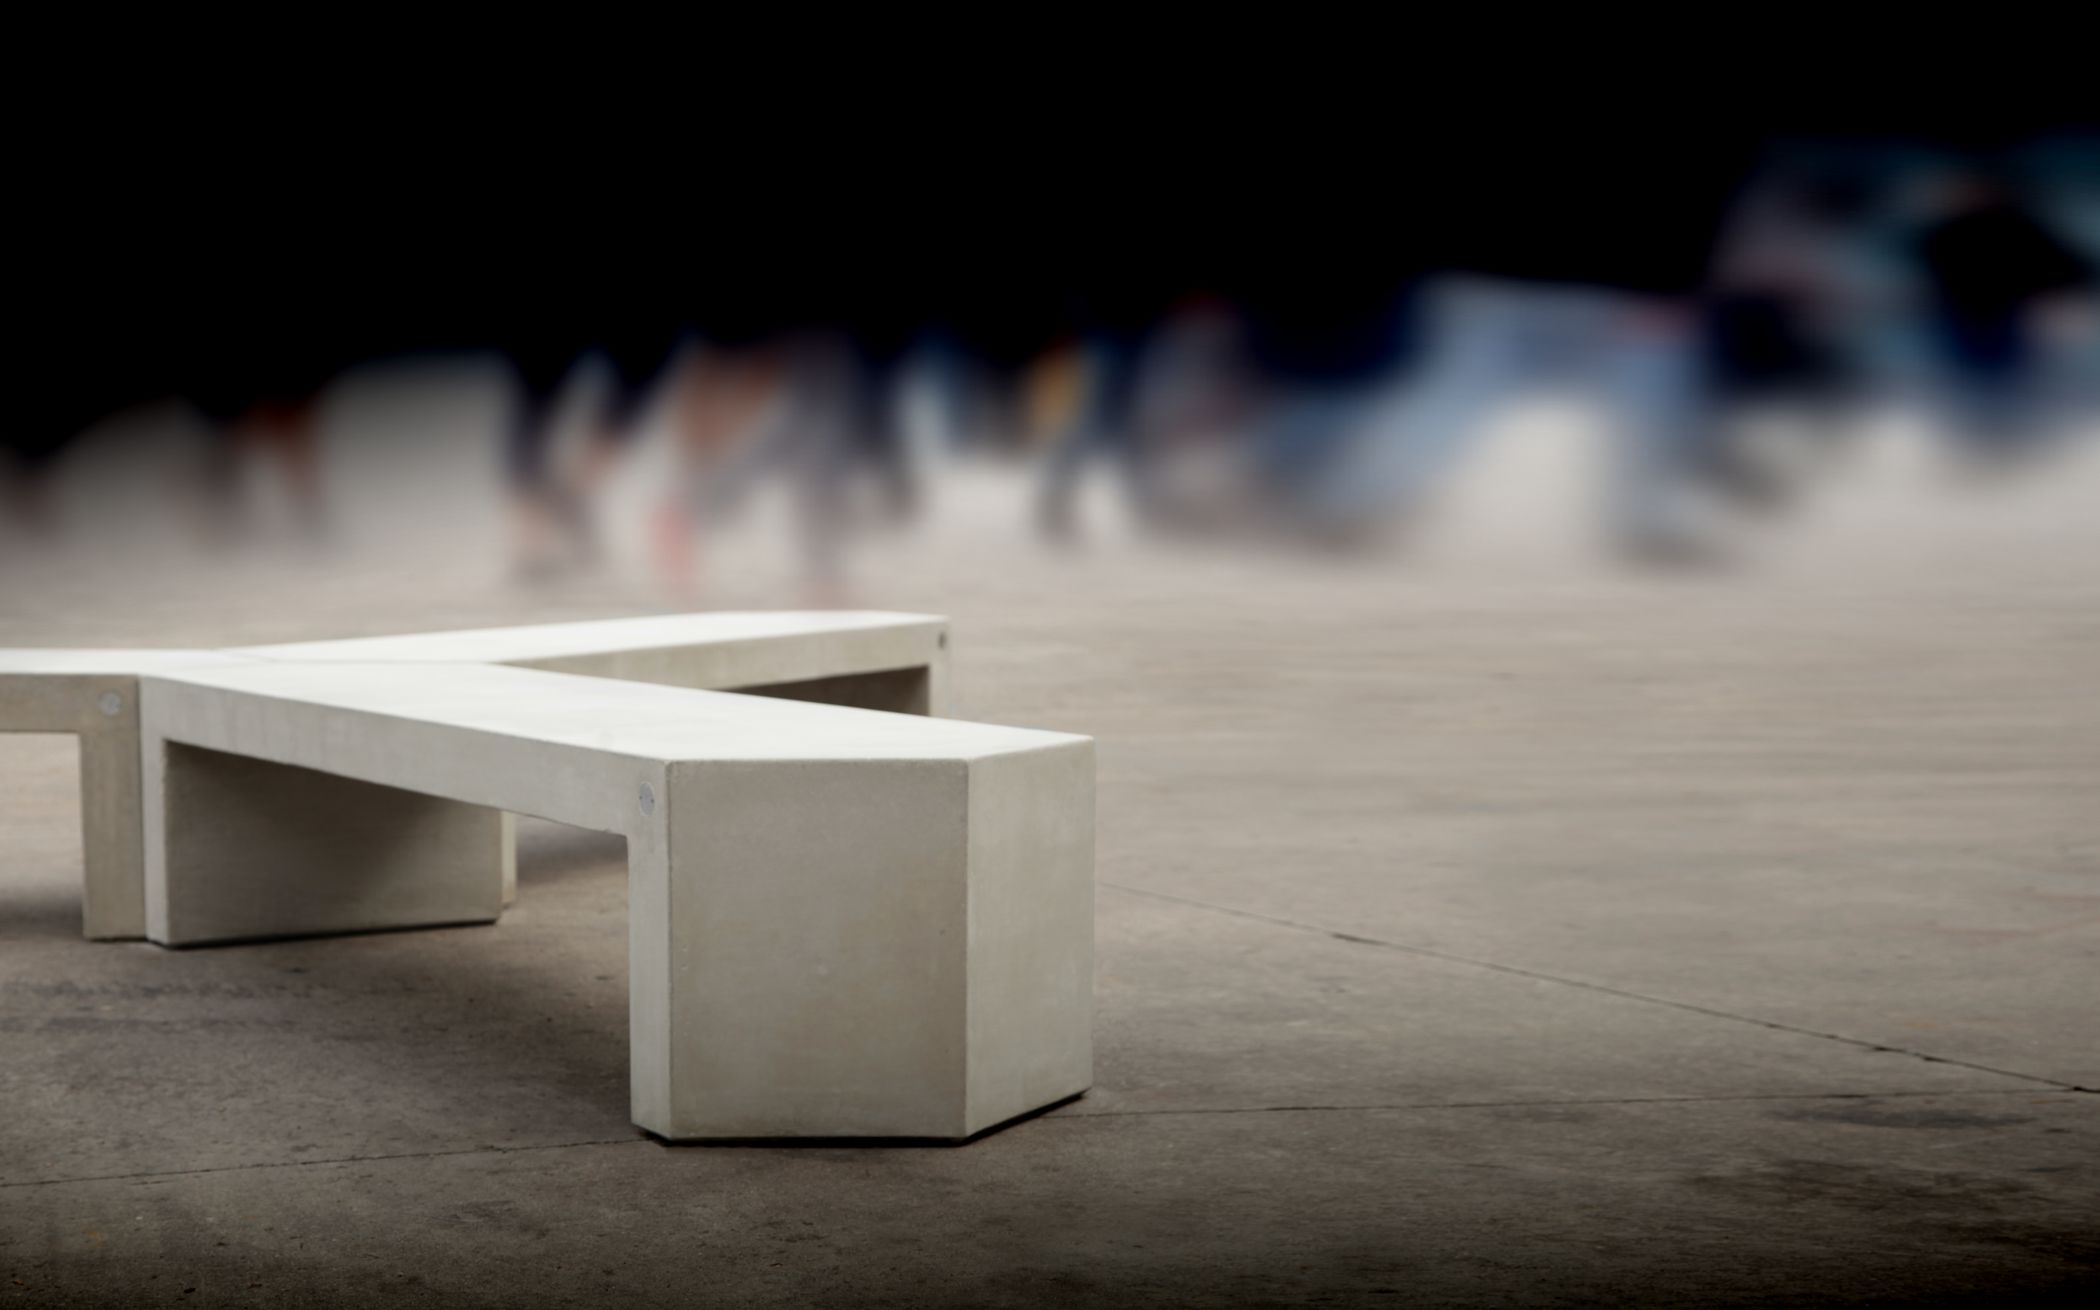 design: Massimo Tasca